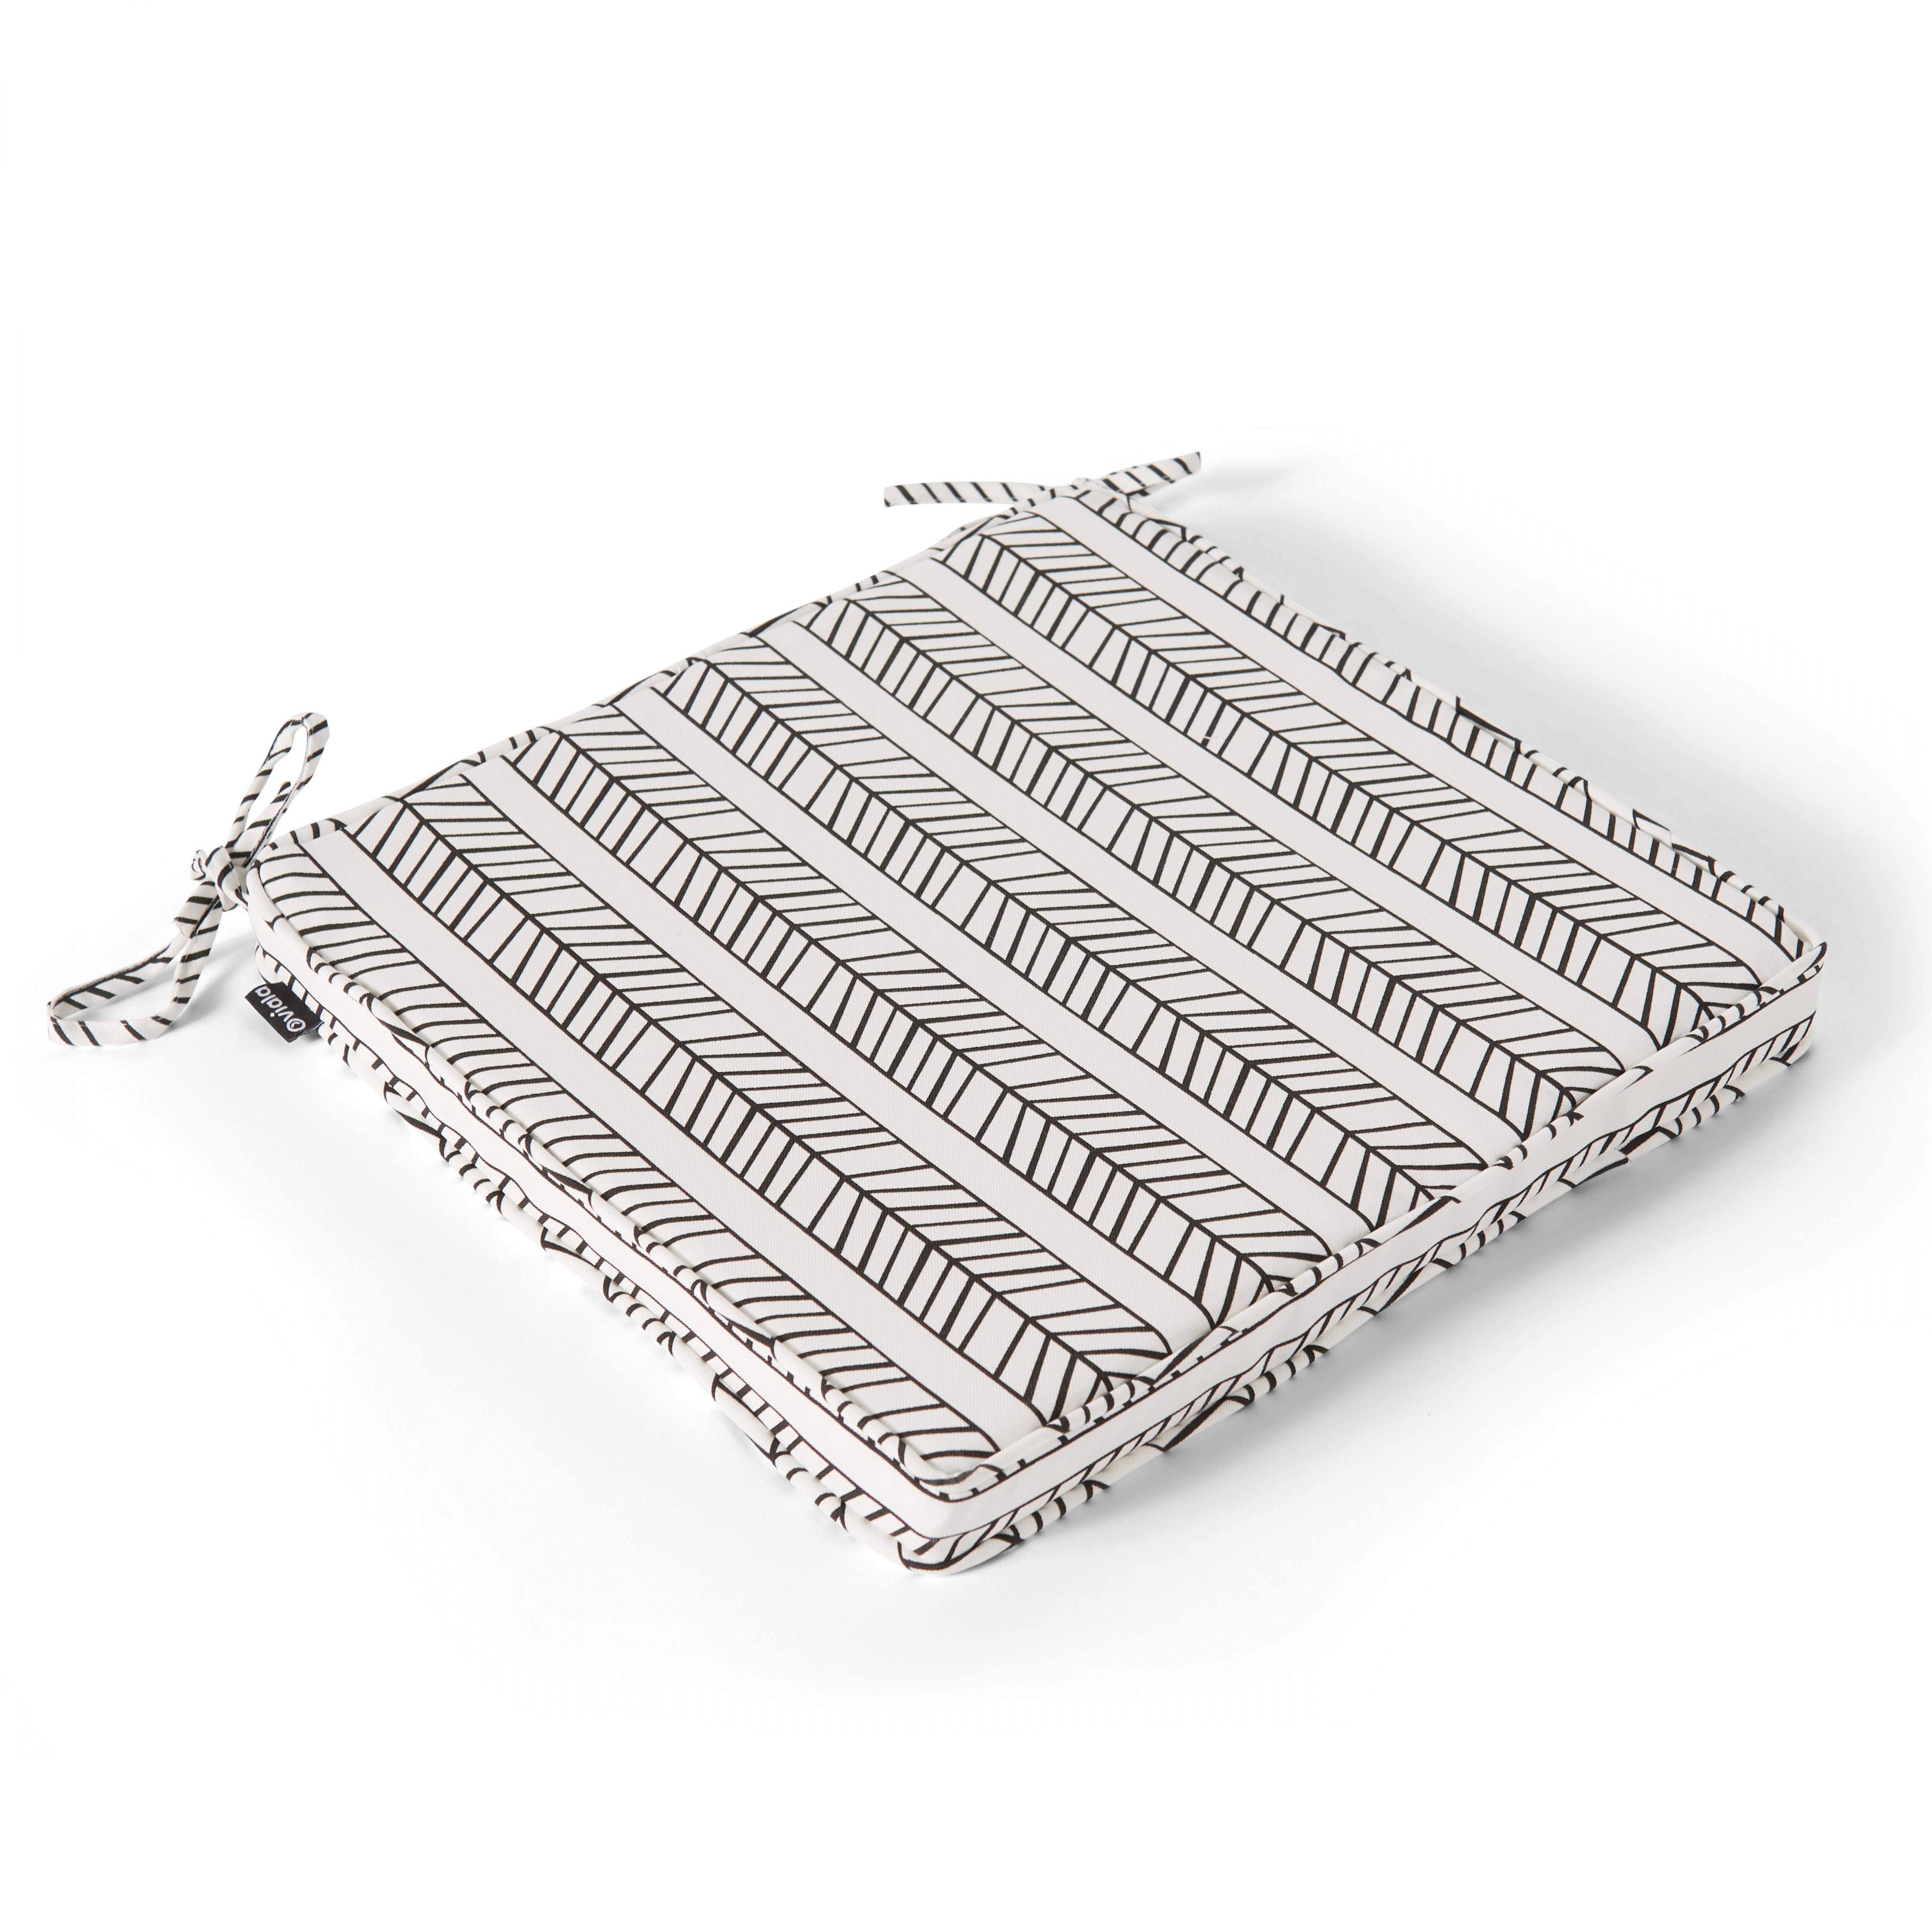 Coussin d'assise en polyester blanc